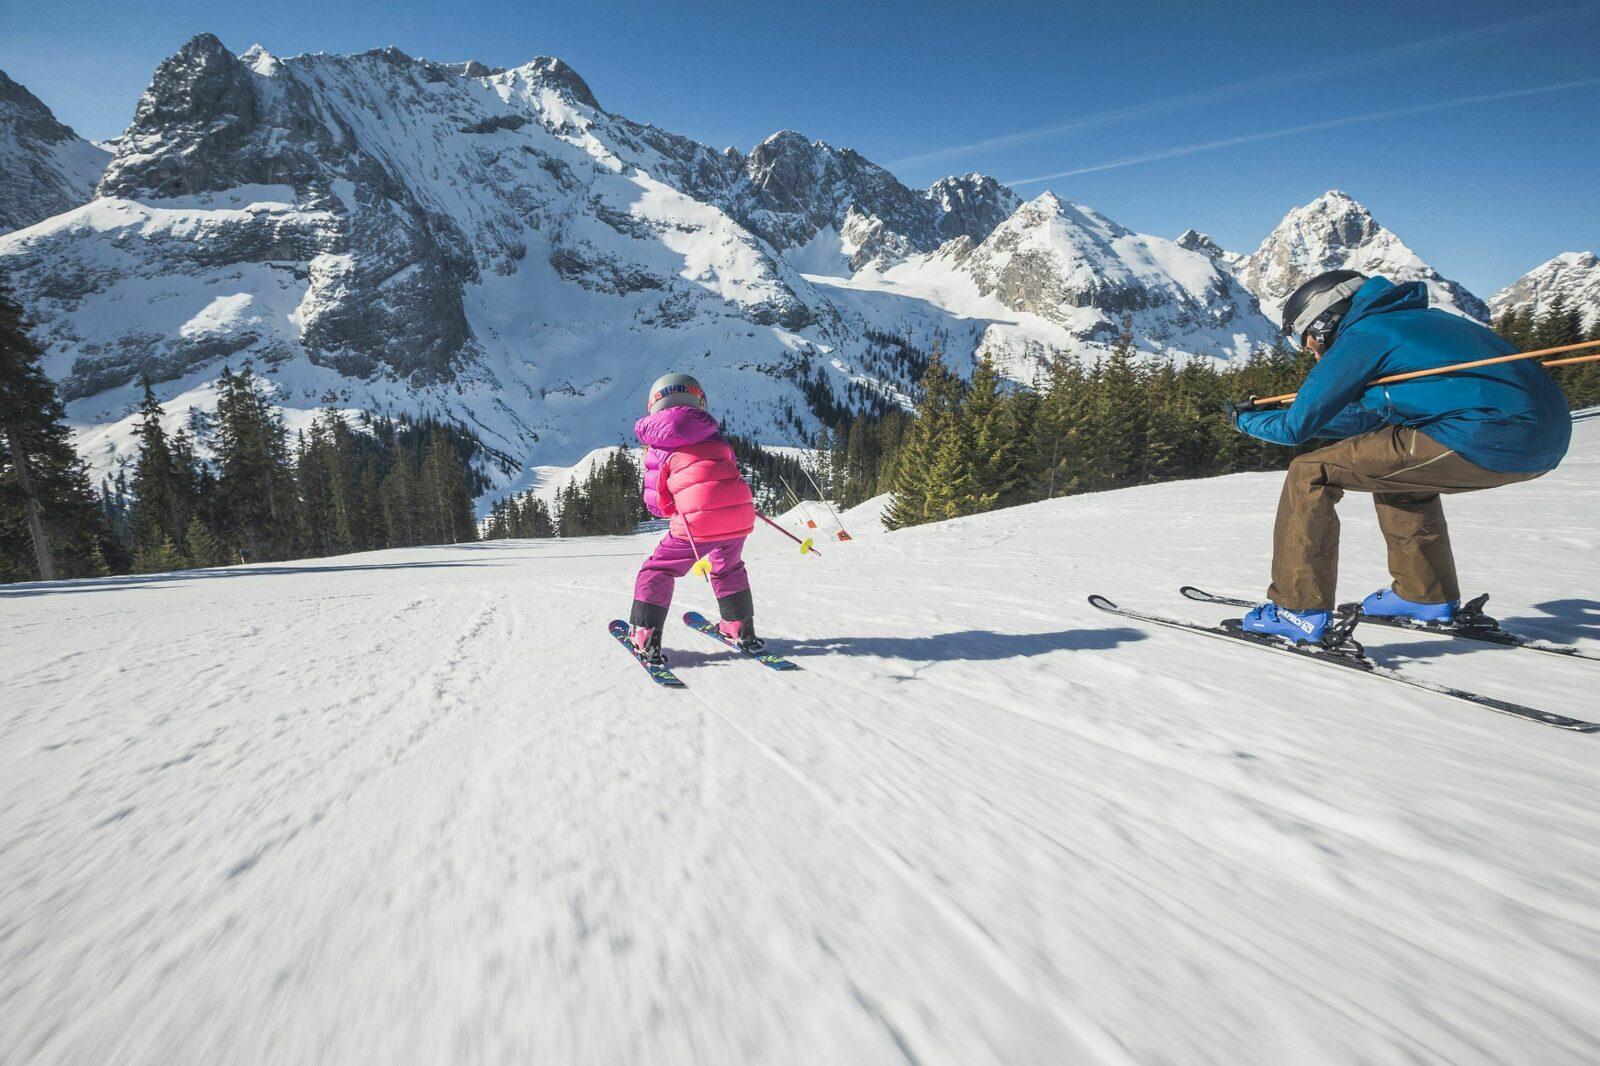 Ski area Wetterstein